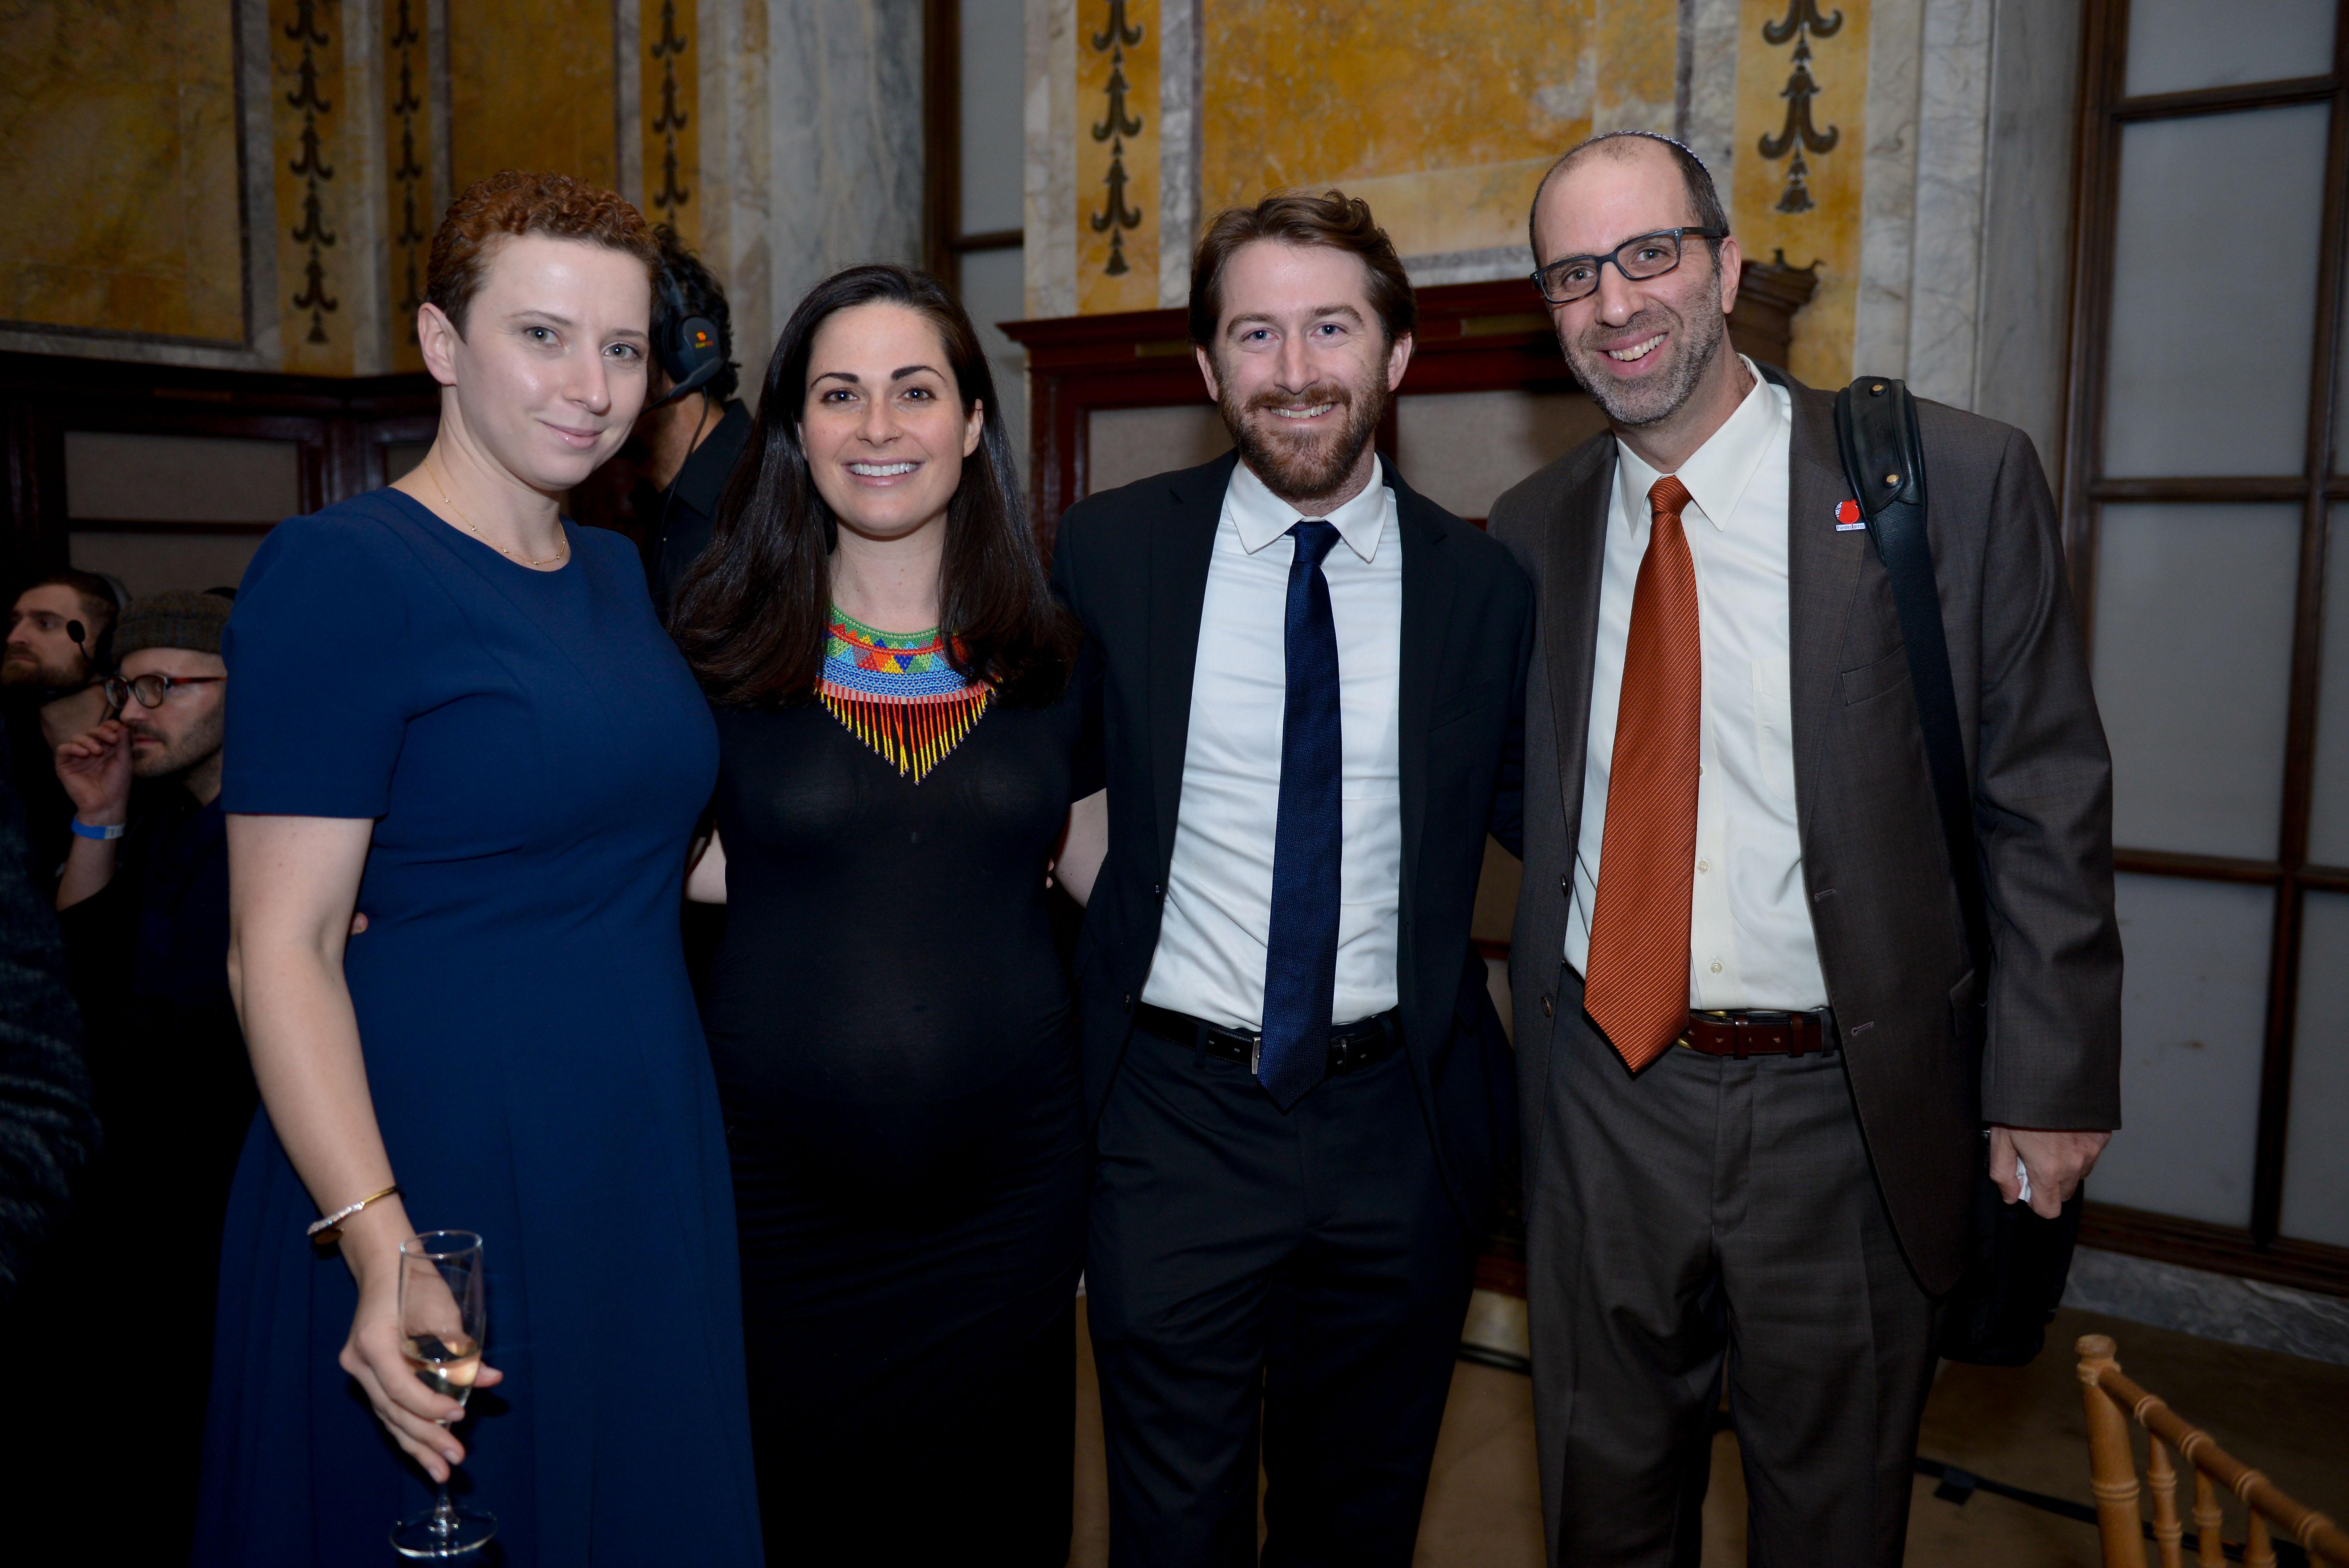 From left: Yelena Pogorelsky, Faith Brigham Leener, Rabbi Jon Leener, and Joshua Chadajo